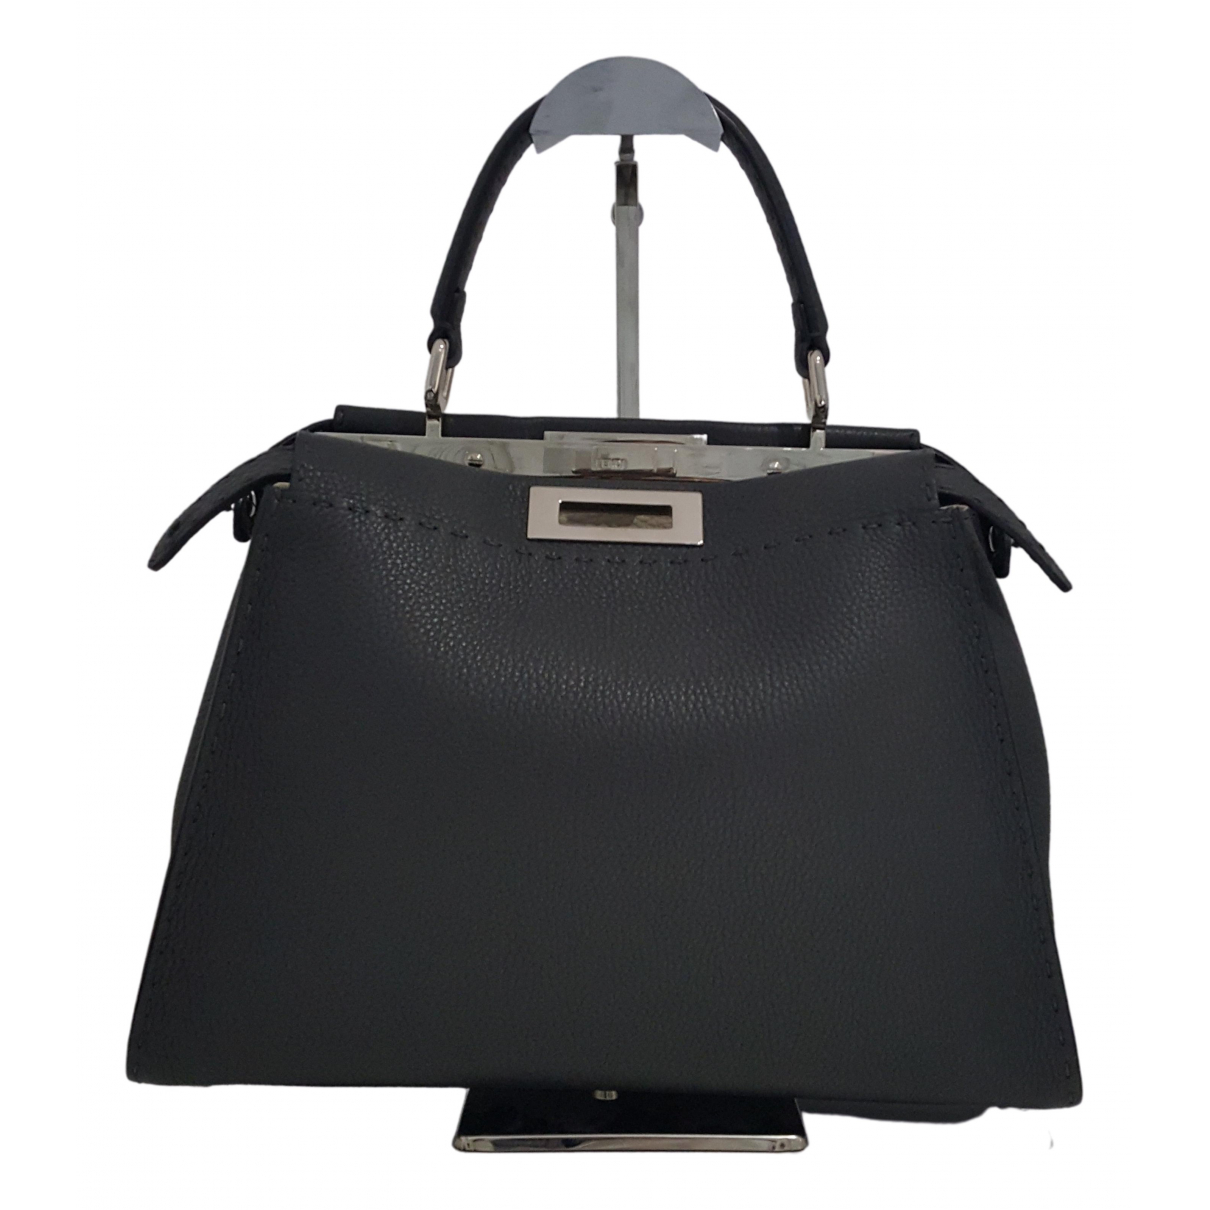 Fendi Peekaboo Handtasche in  Grau Leder